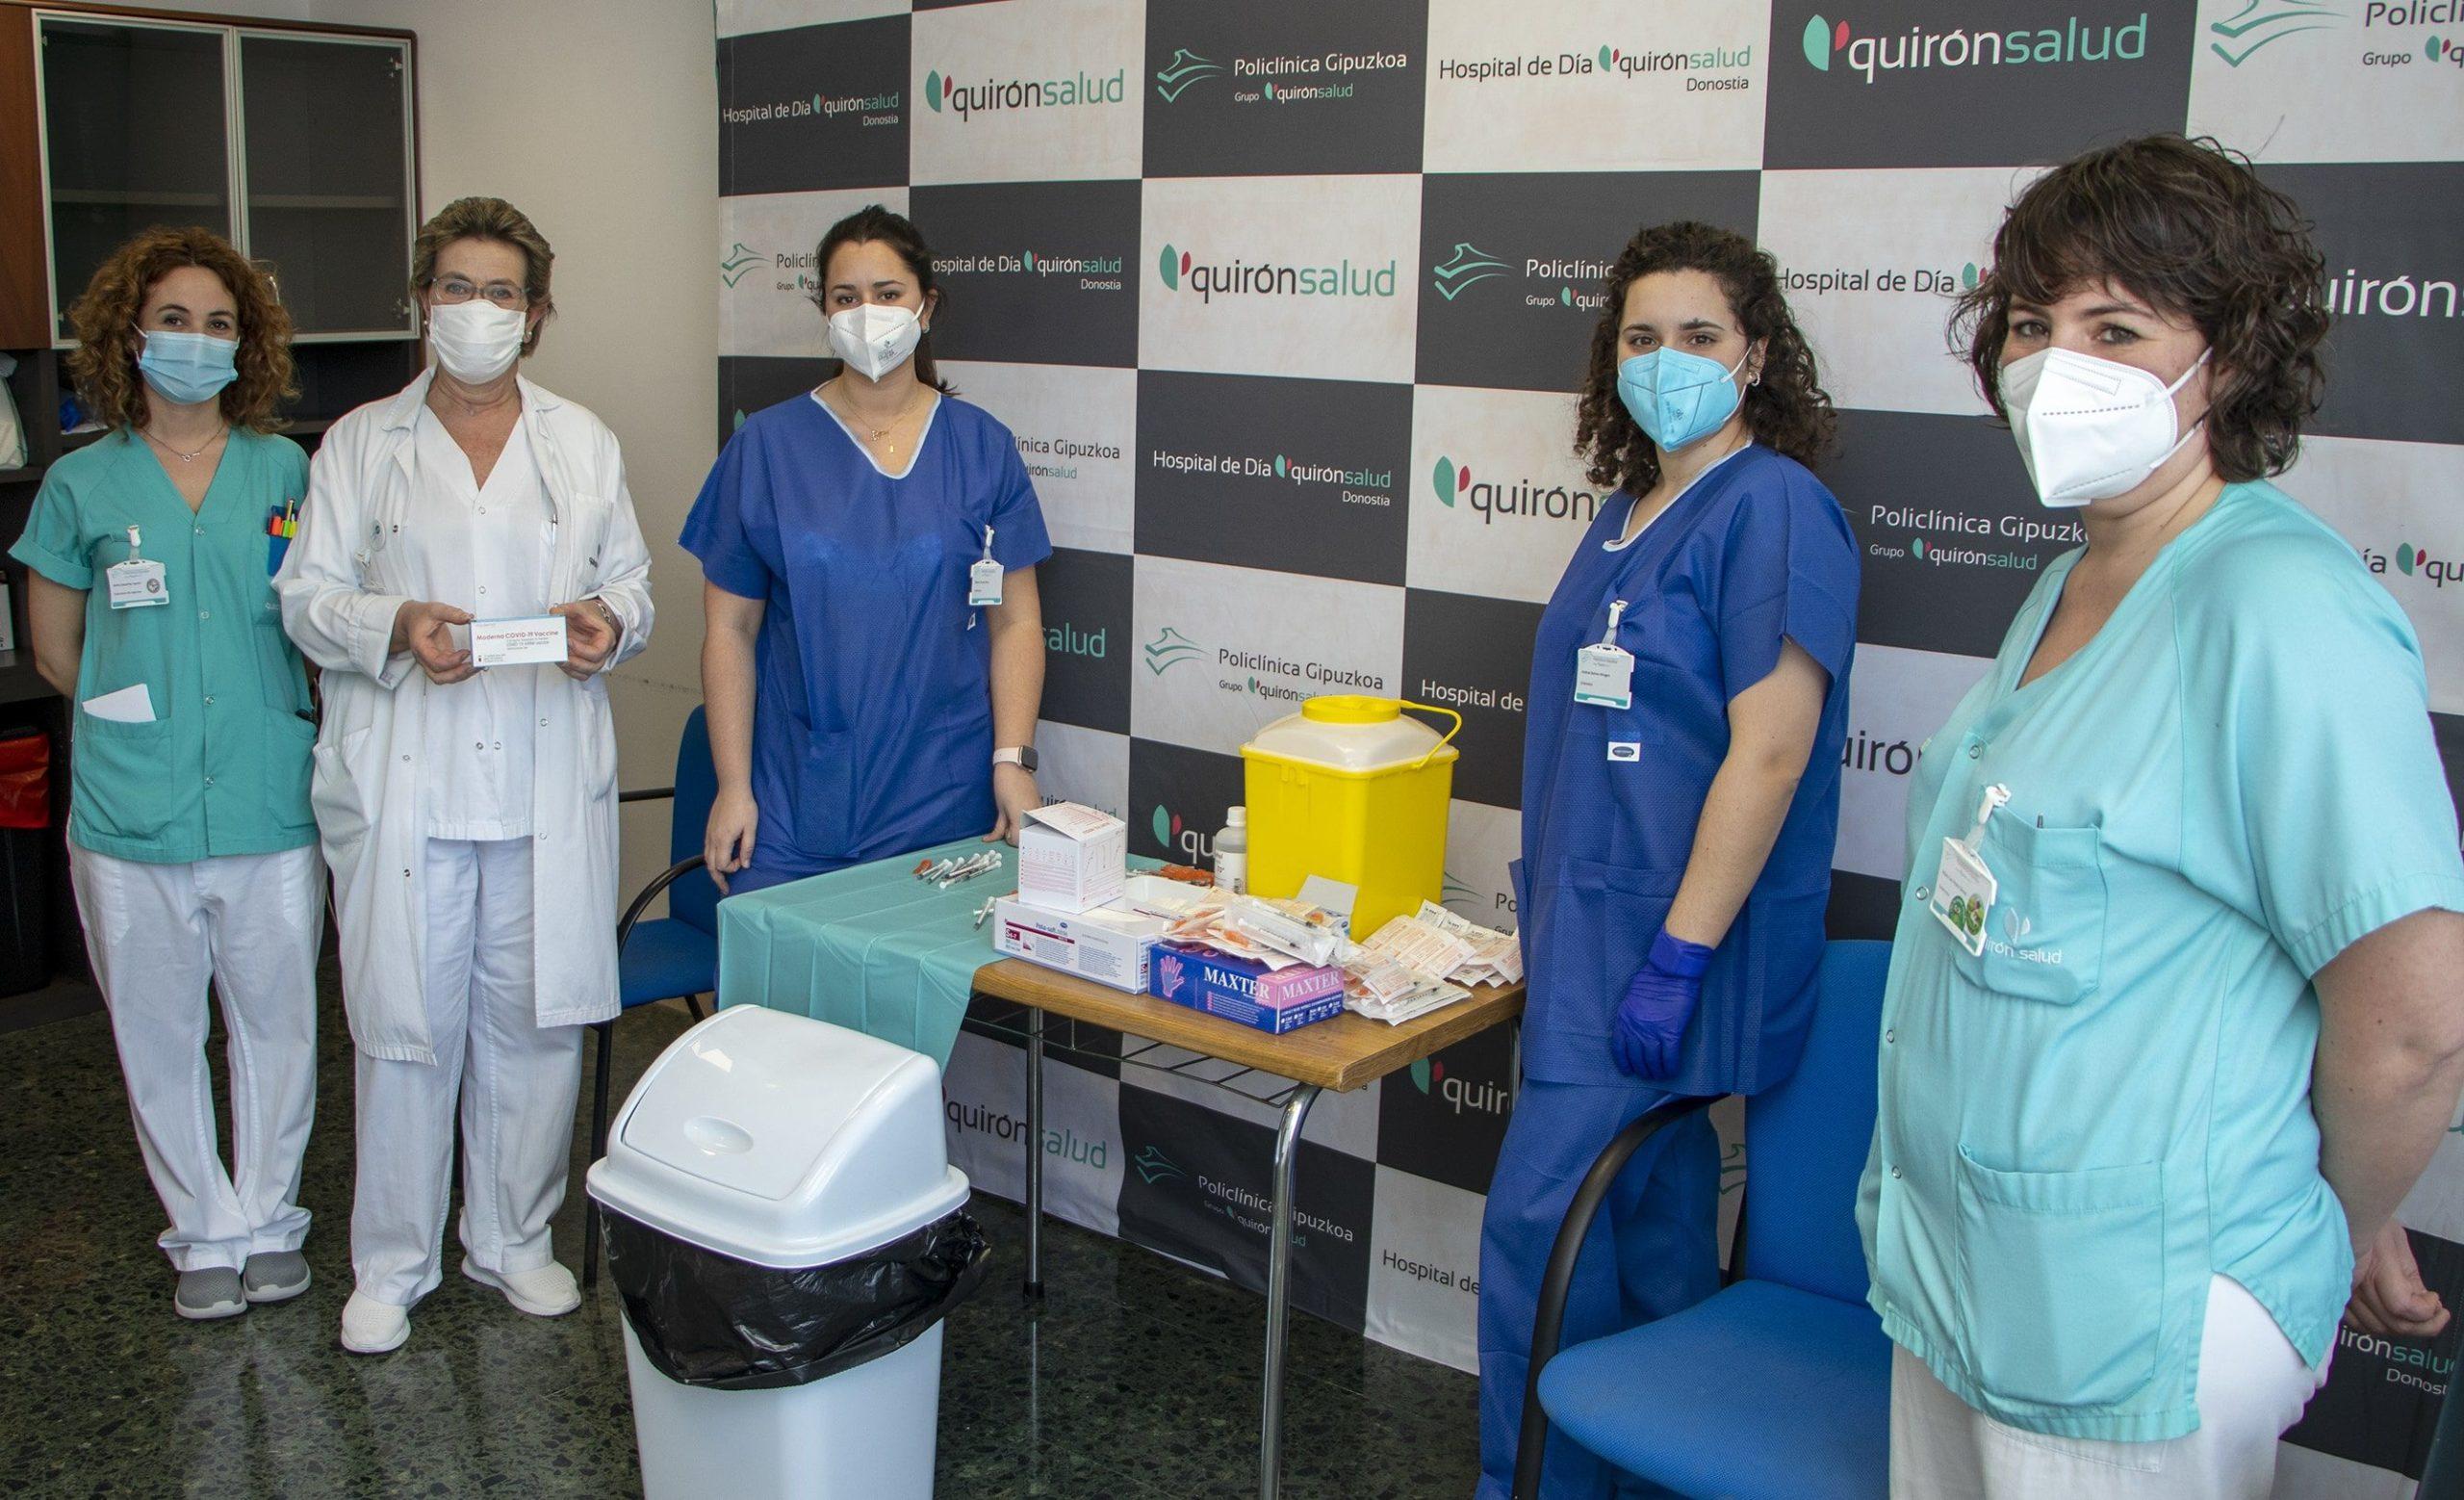 Comienza la vacunación en Policlínica Gipuzkoa